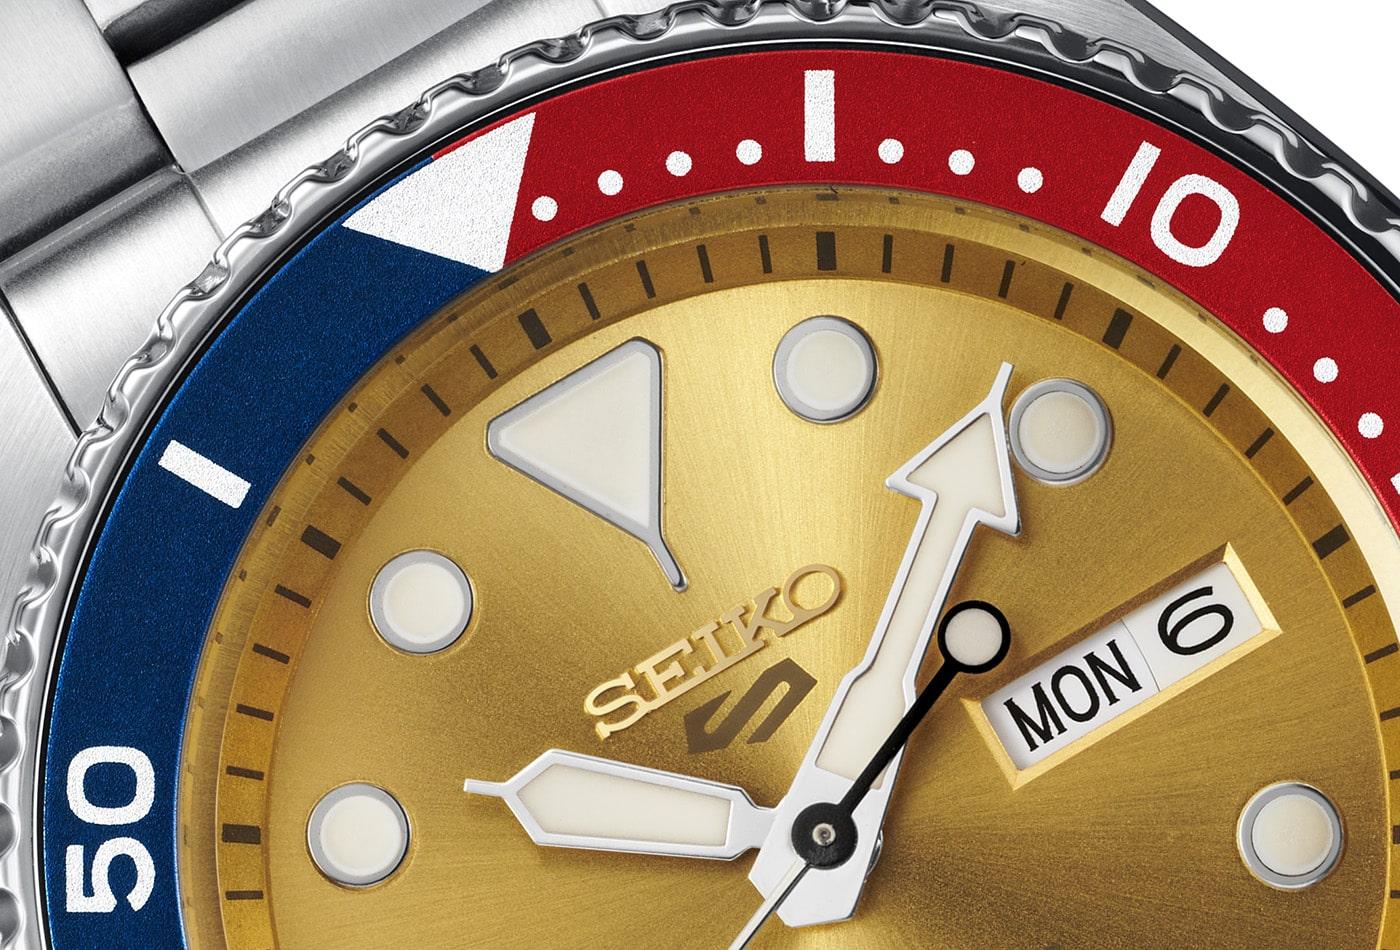 Seiko 5 Sports Custom Watch Beatmaker 2021 Limited Edition 5 min